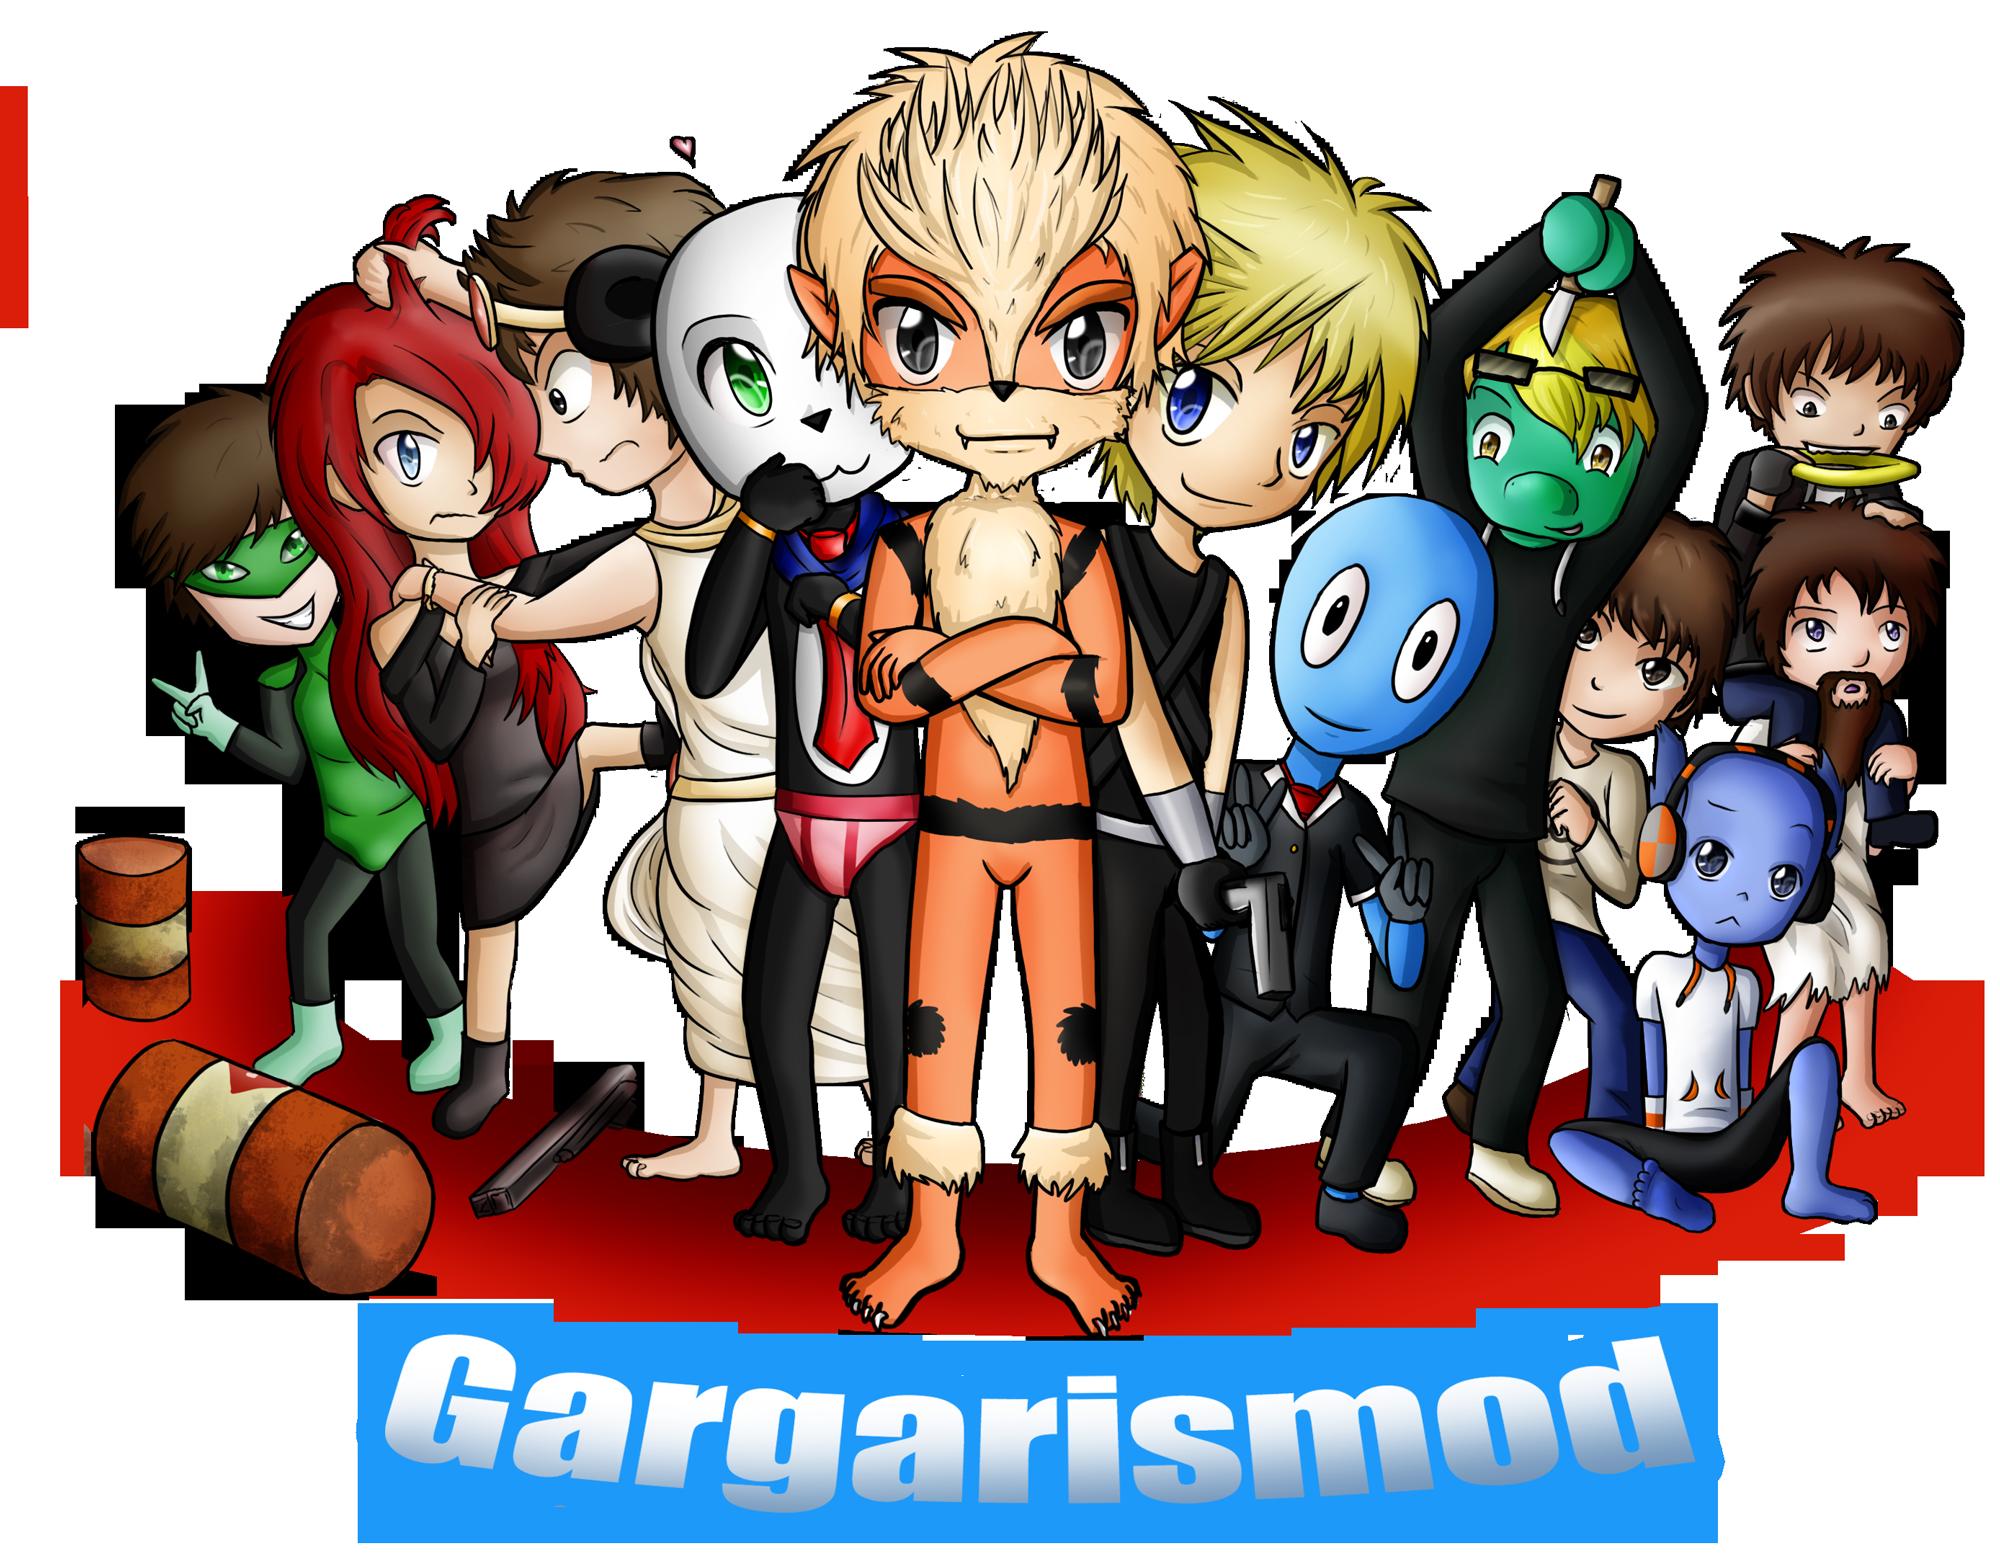 Elspawn - Elspawn et la team Gargarismod